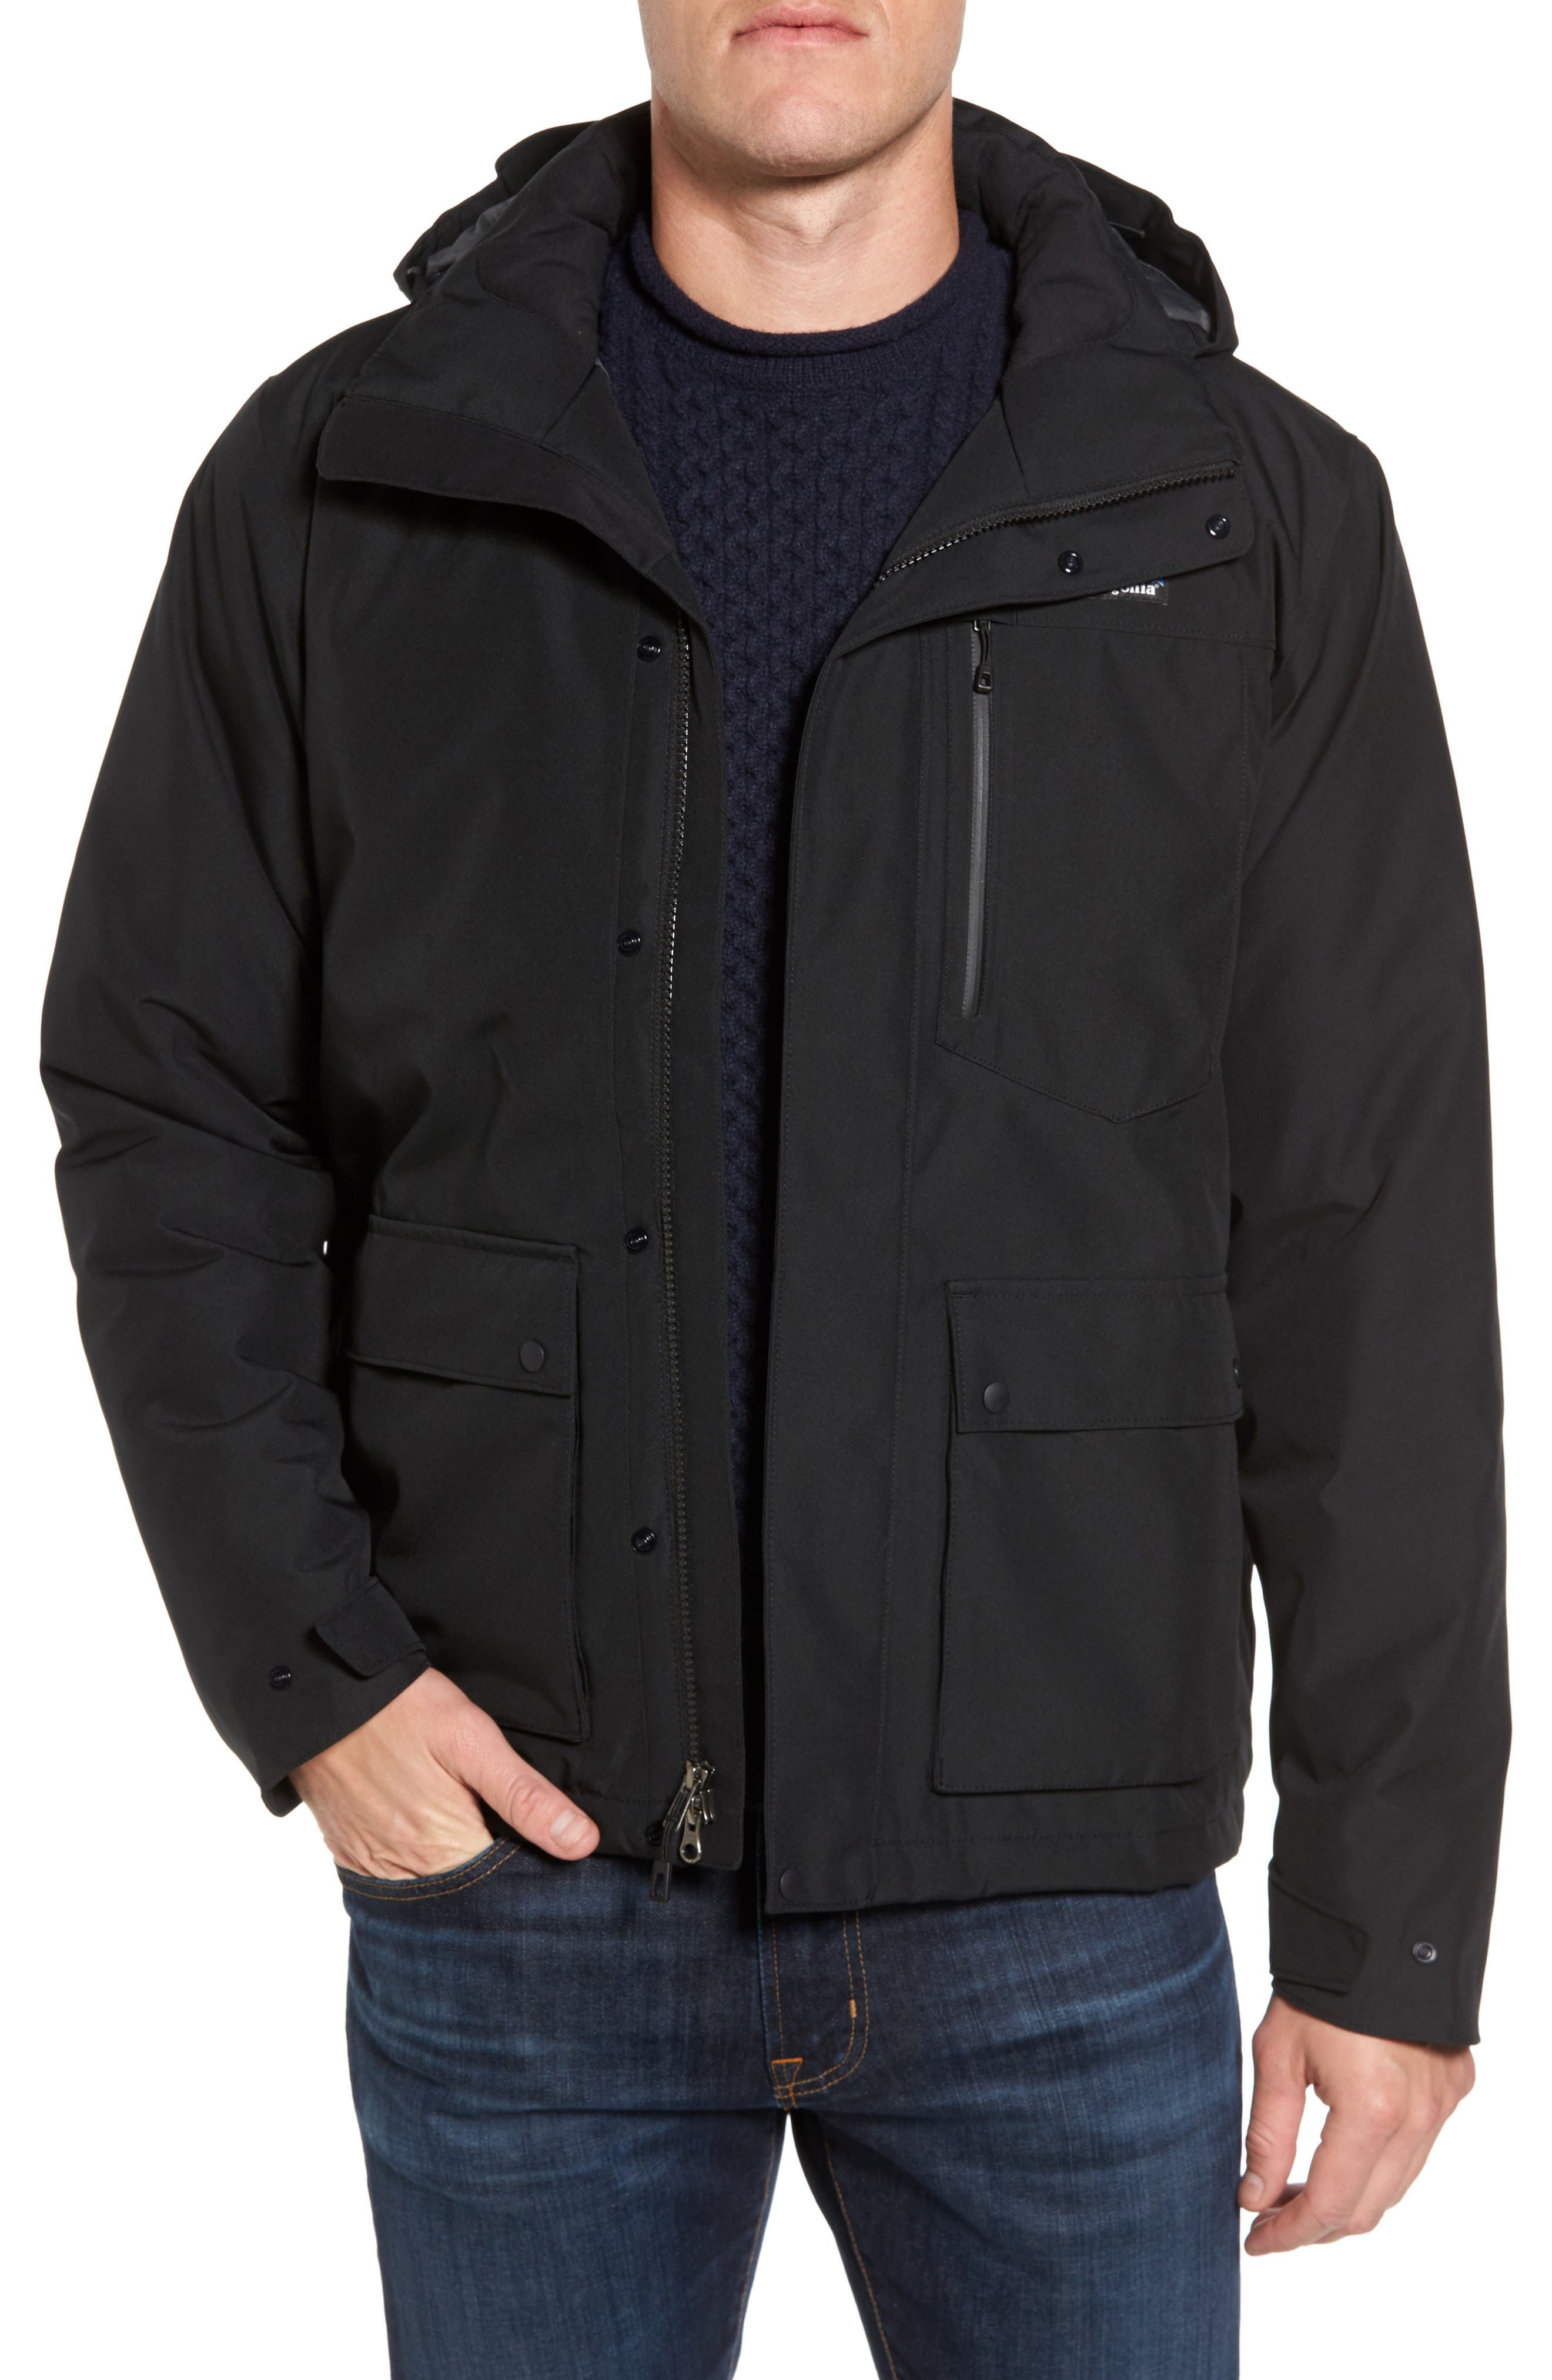 Patagonia Men S Jackets Coats Parkas Sustainable